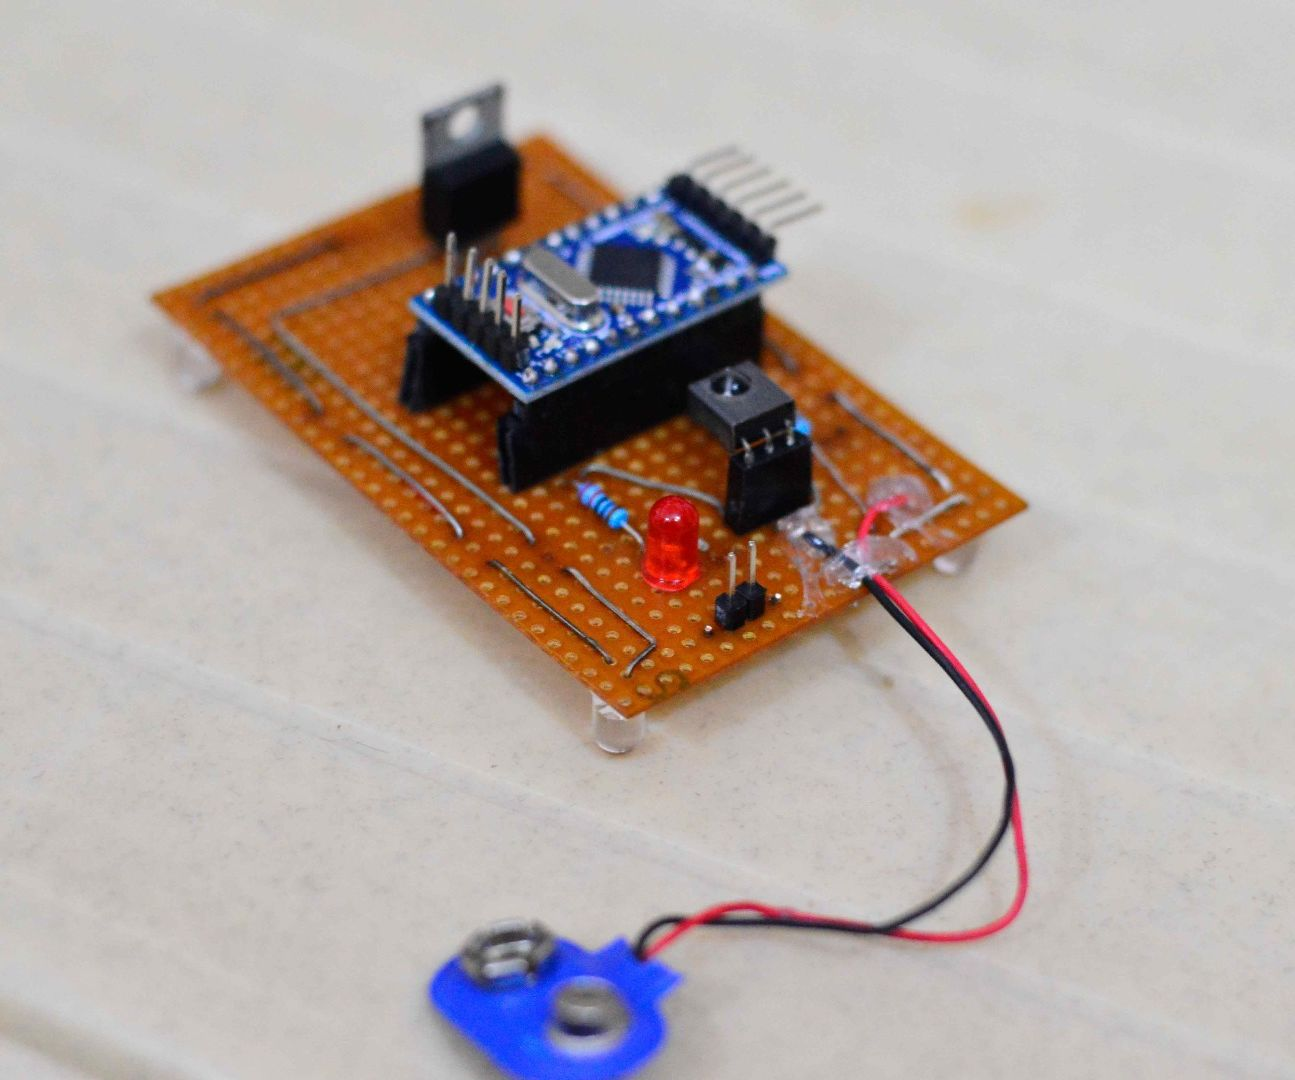 Arduino based remote translator